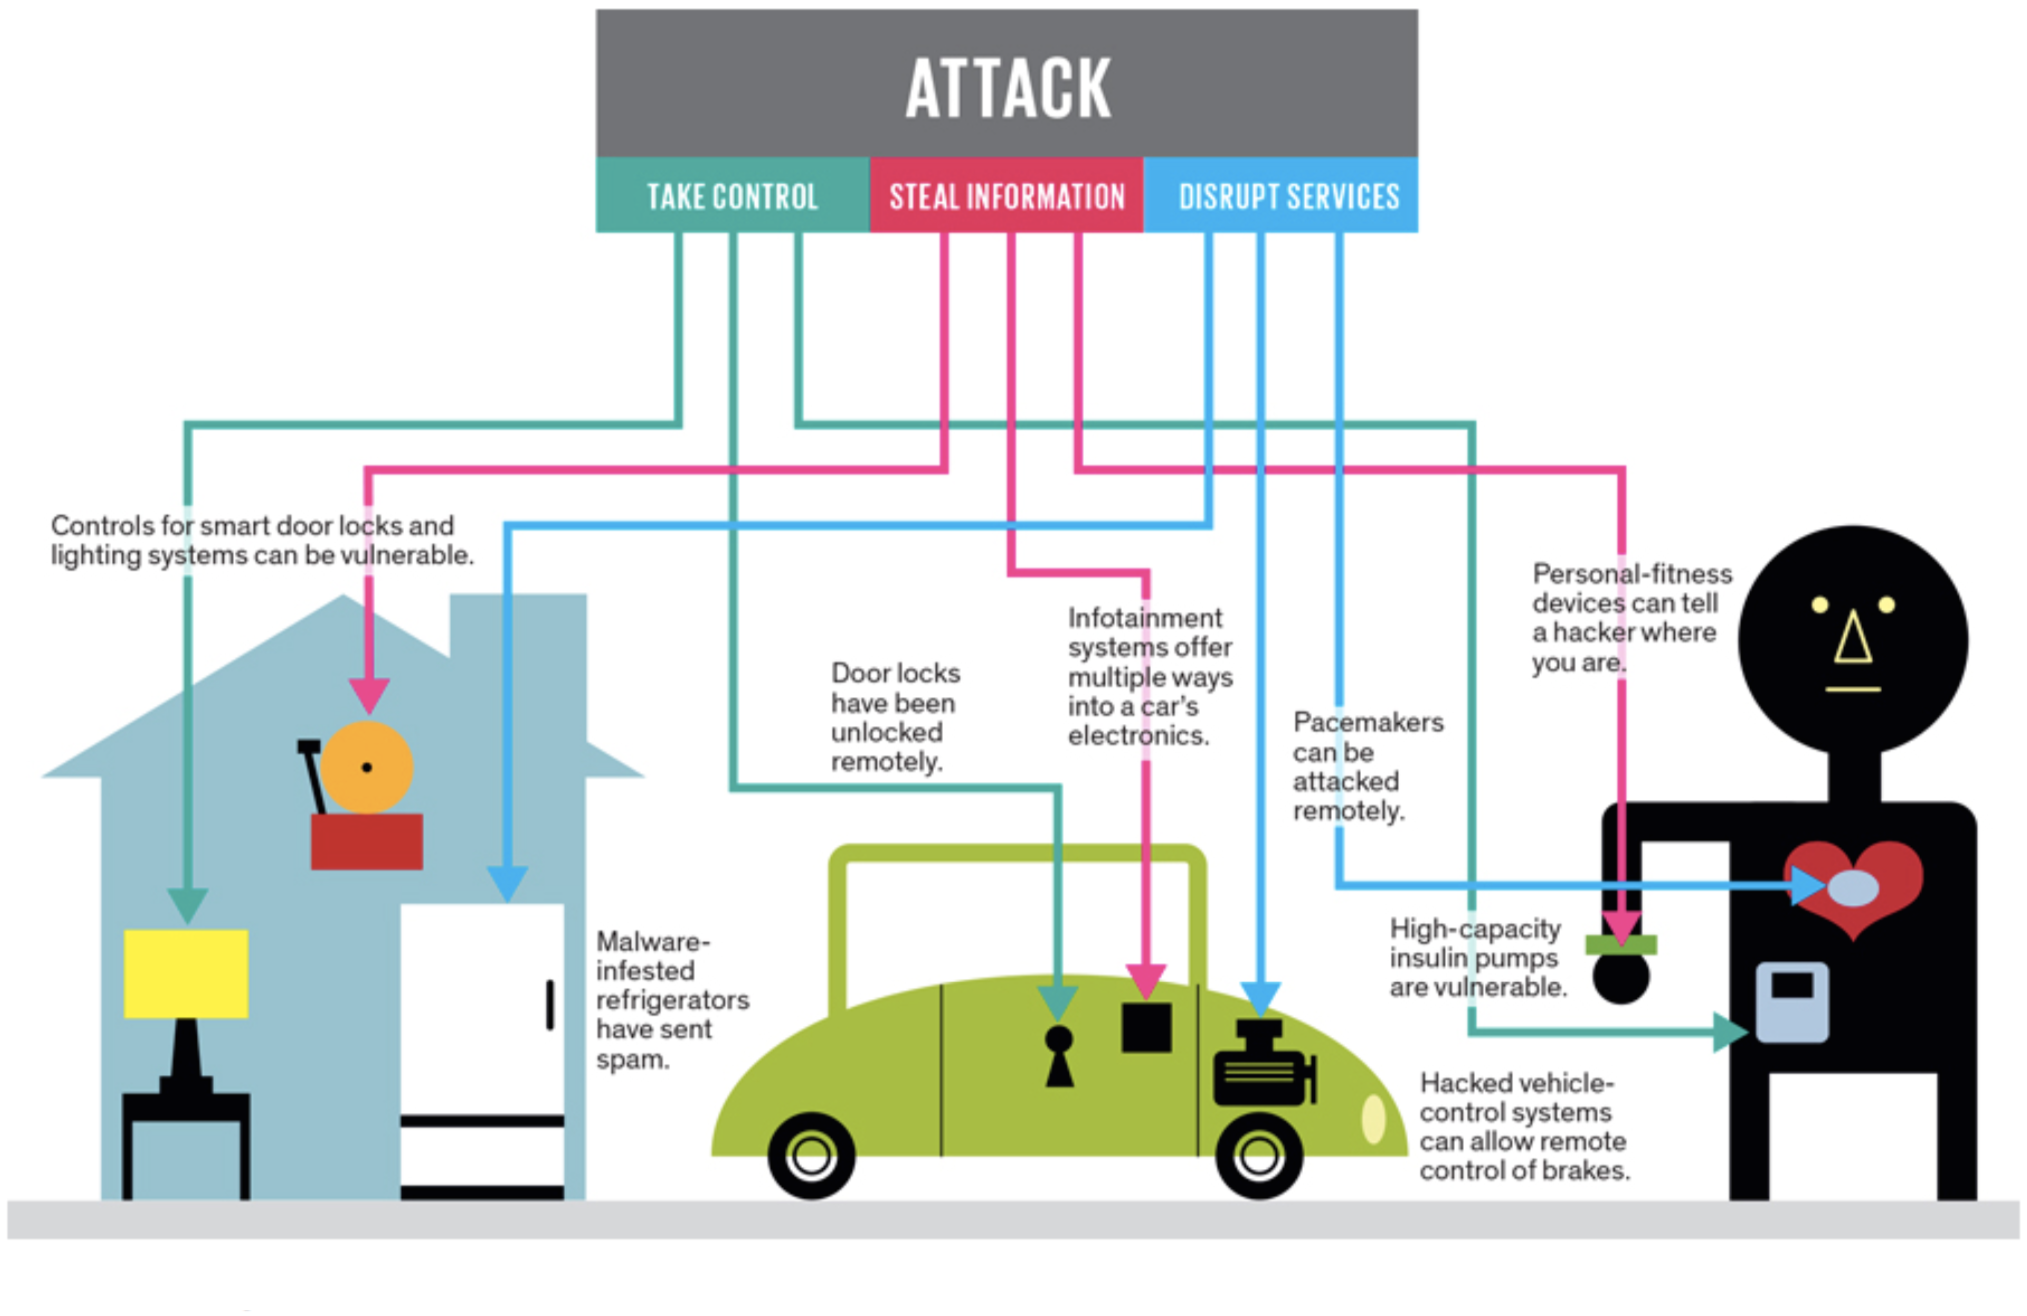 امنیت ،اینترنت اشیا